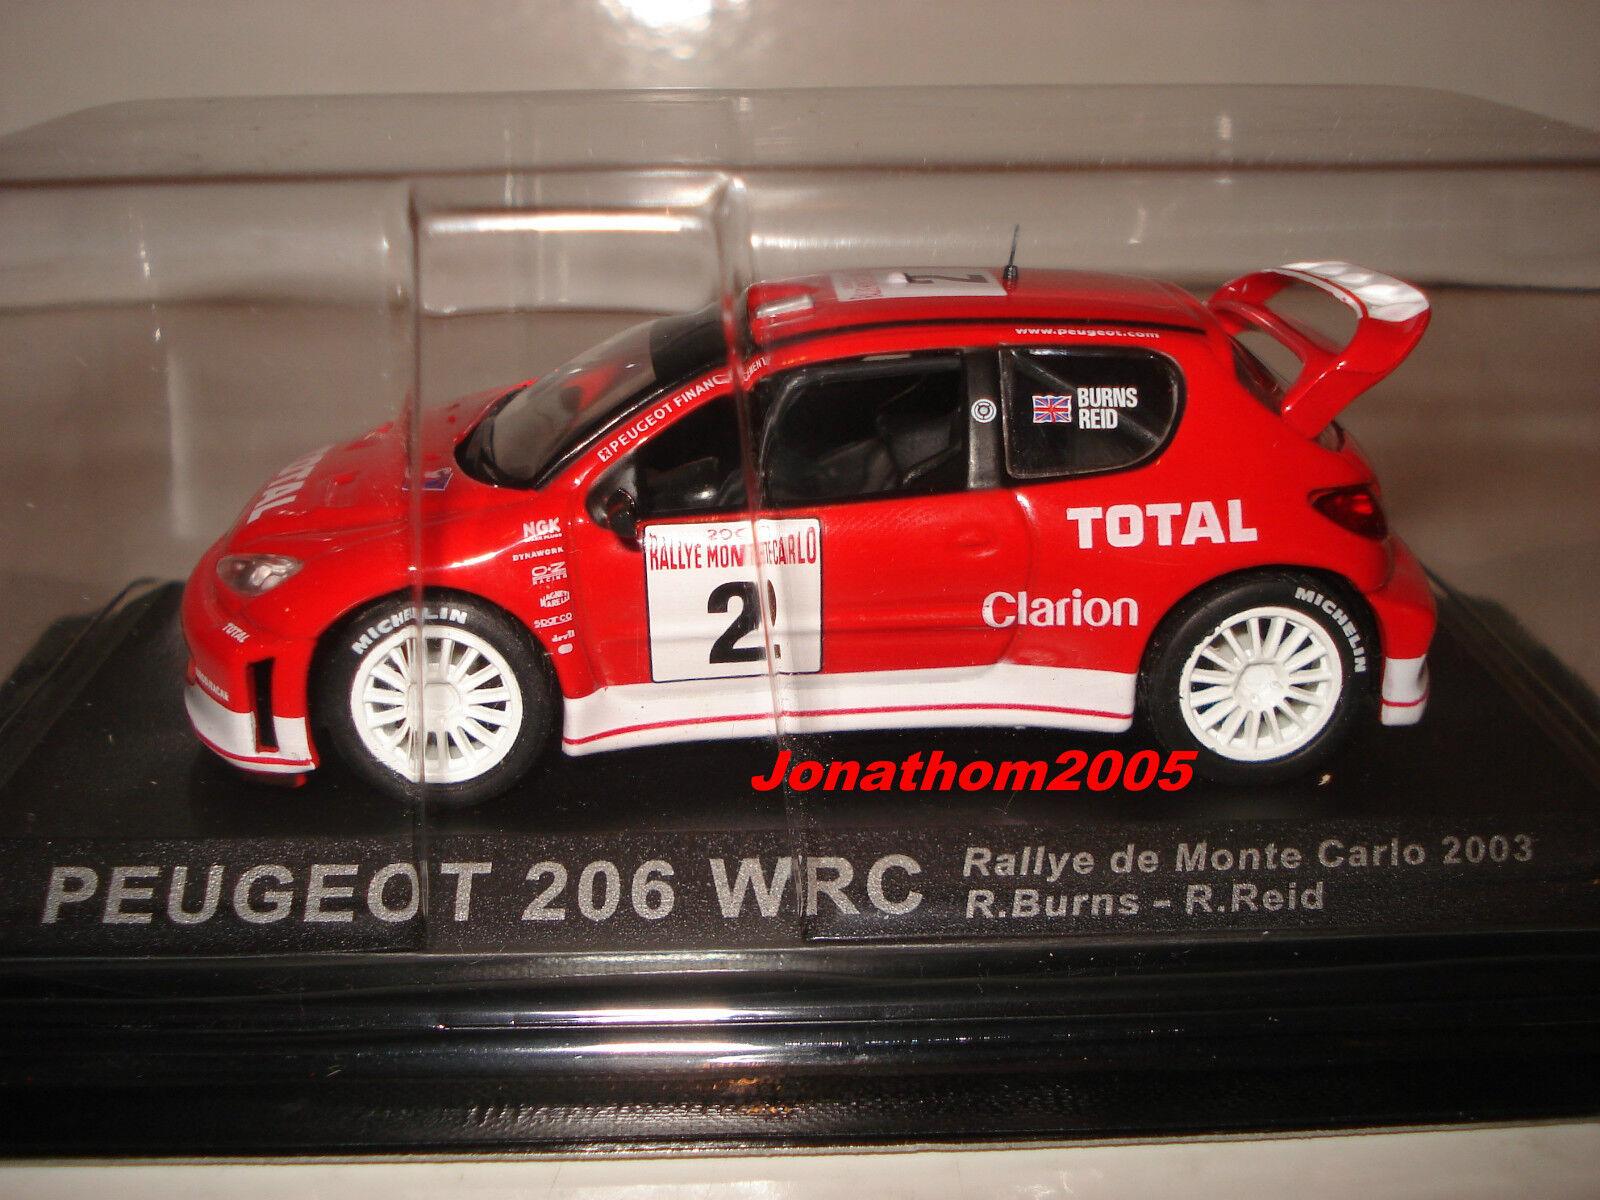 PEUGEOT 206 WRC WRC WRC RALLY MOUNTED CARLO 2003 - BURNS - REID to the 1 43° 2f3ec5